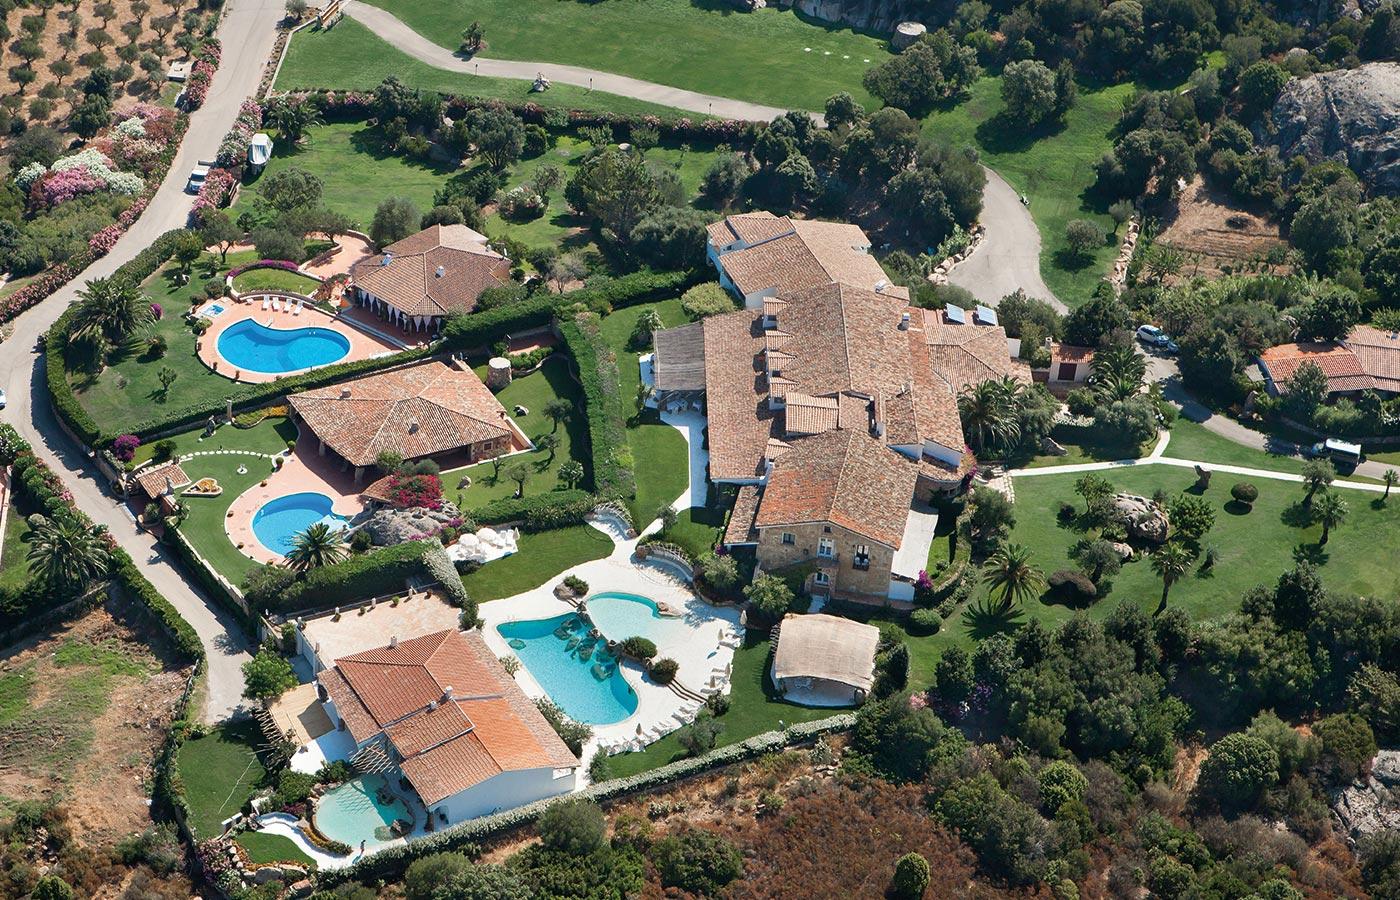 L'hotel Pulicinu a Baja Sardinia visto dall'alto